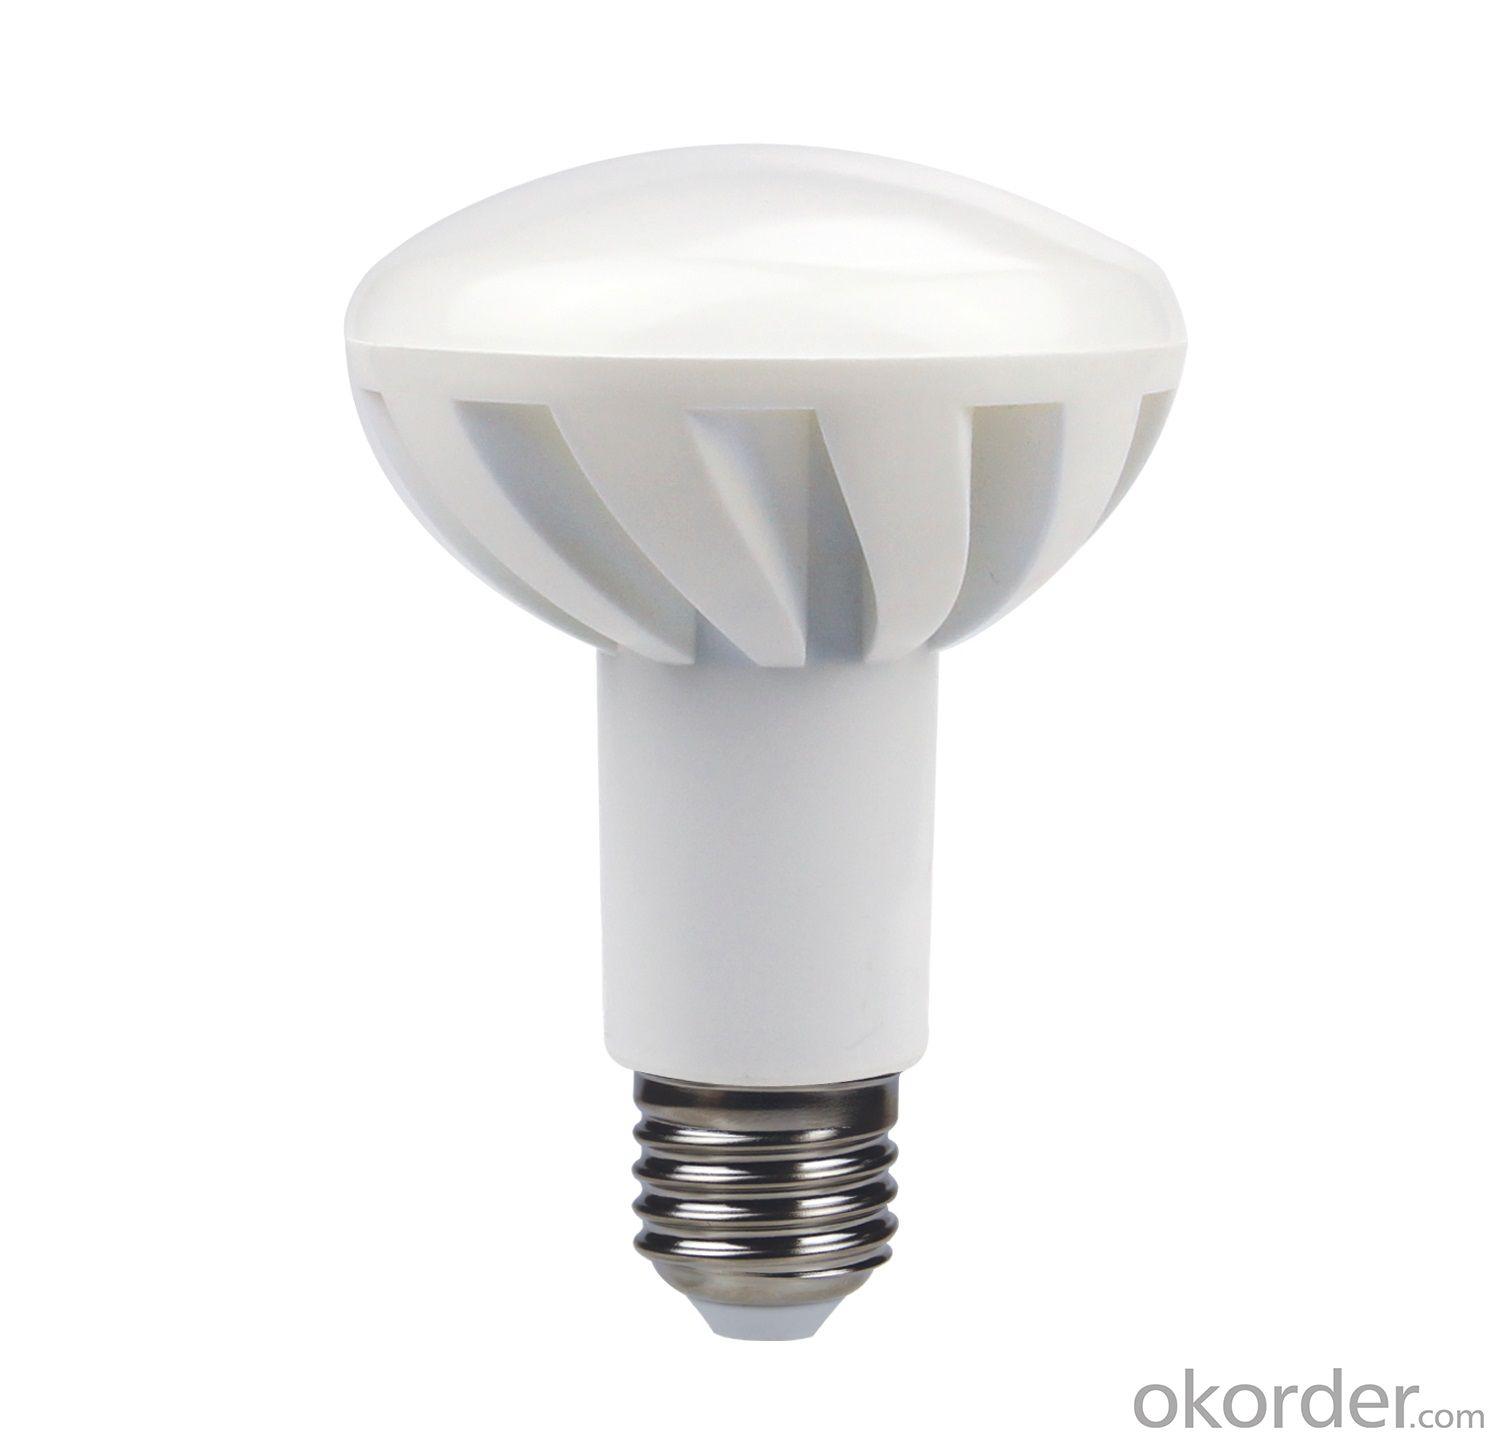 LED Bulb Light E27 R63 9W 800 Lumen Non Dimmable